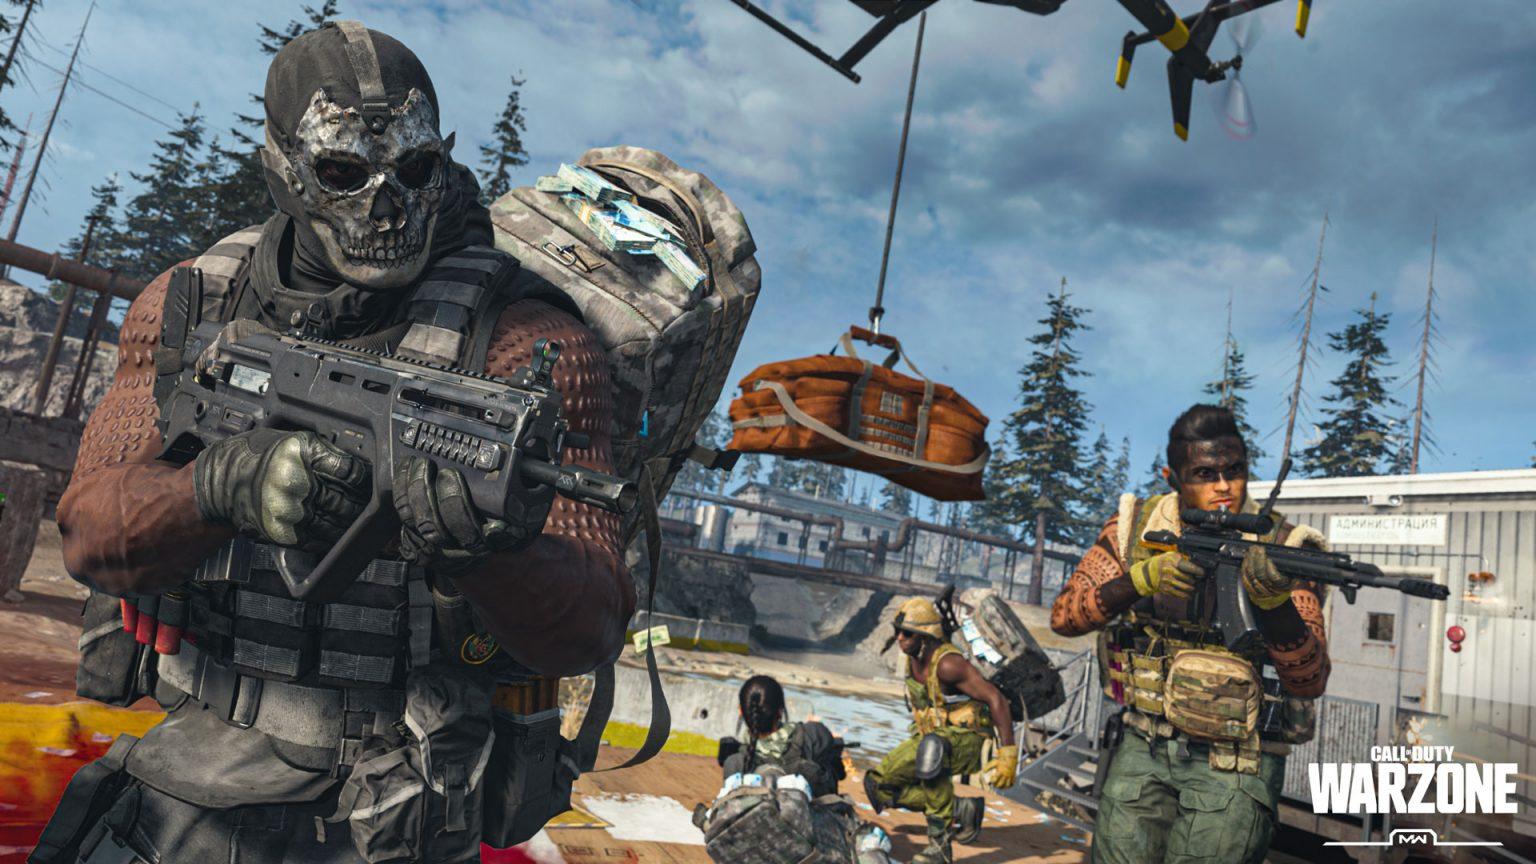 Is Call Of Duty Warzone Cross Platform?